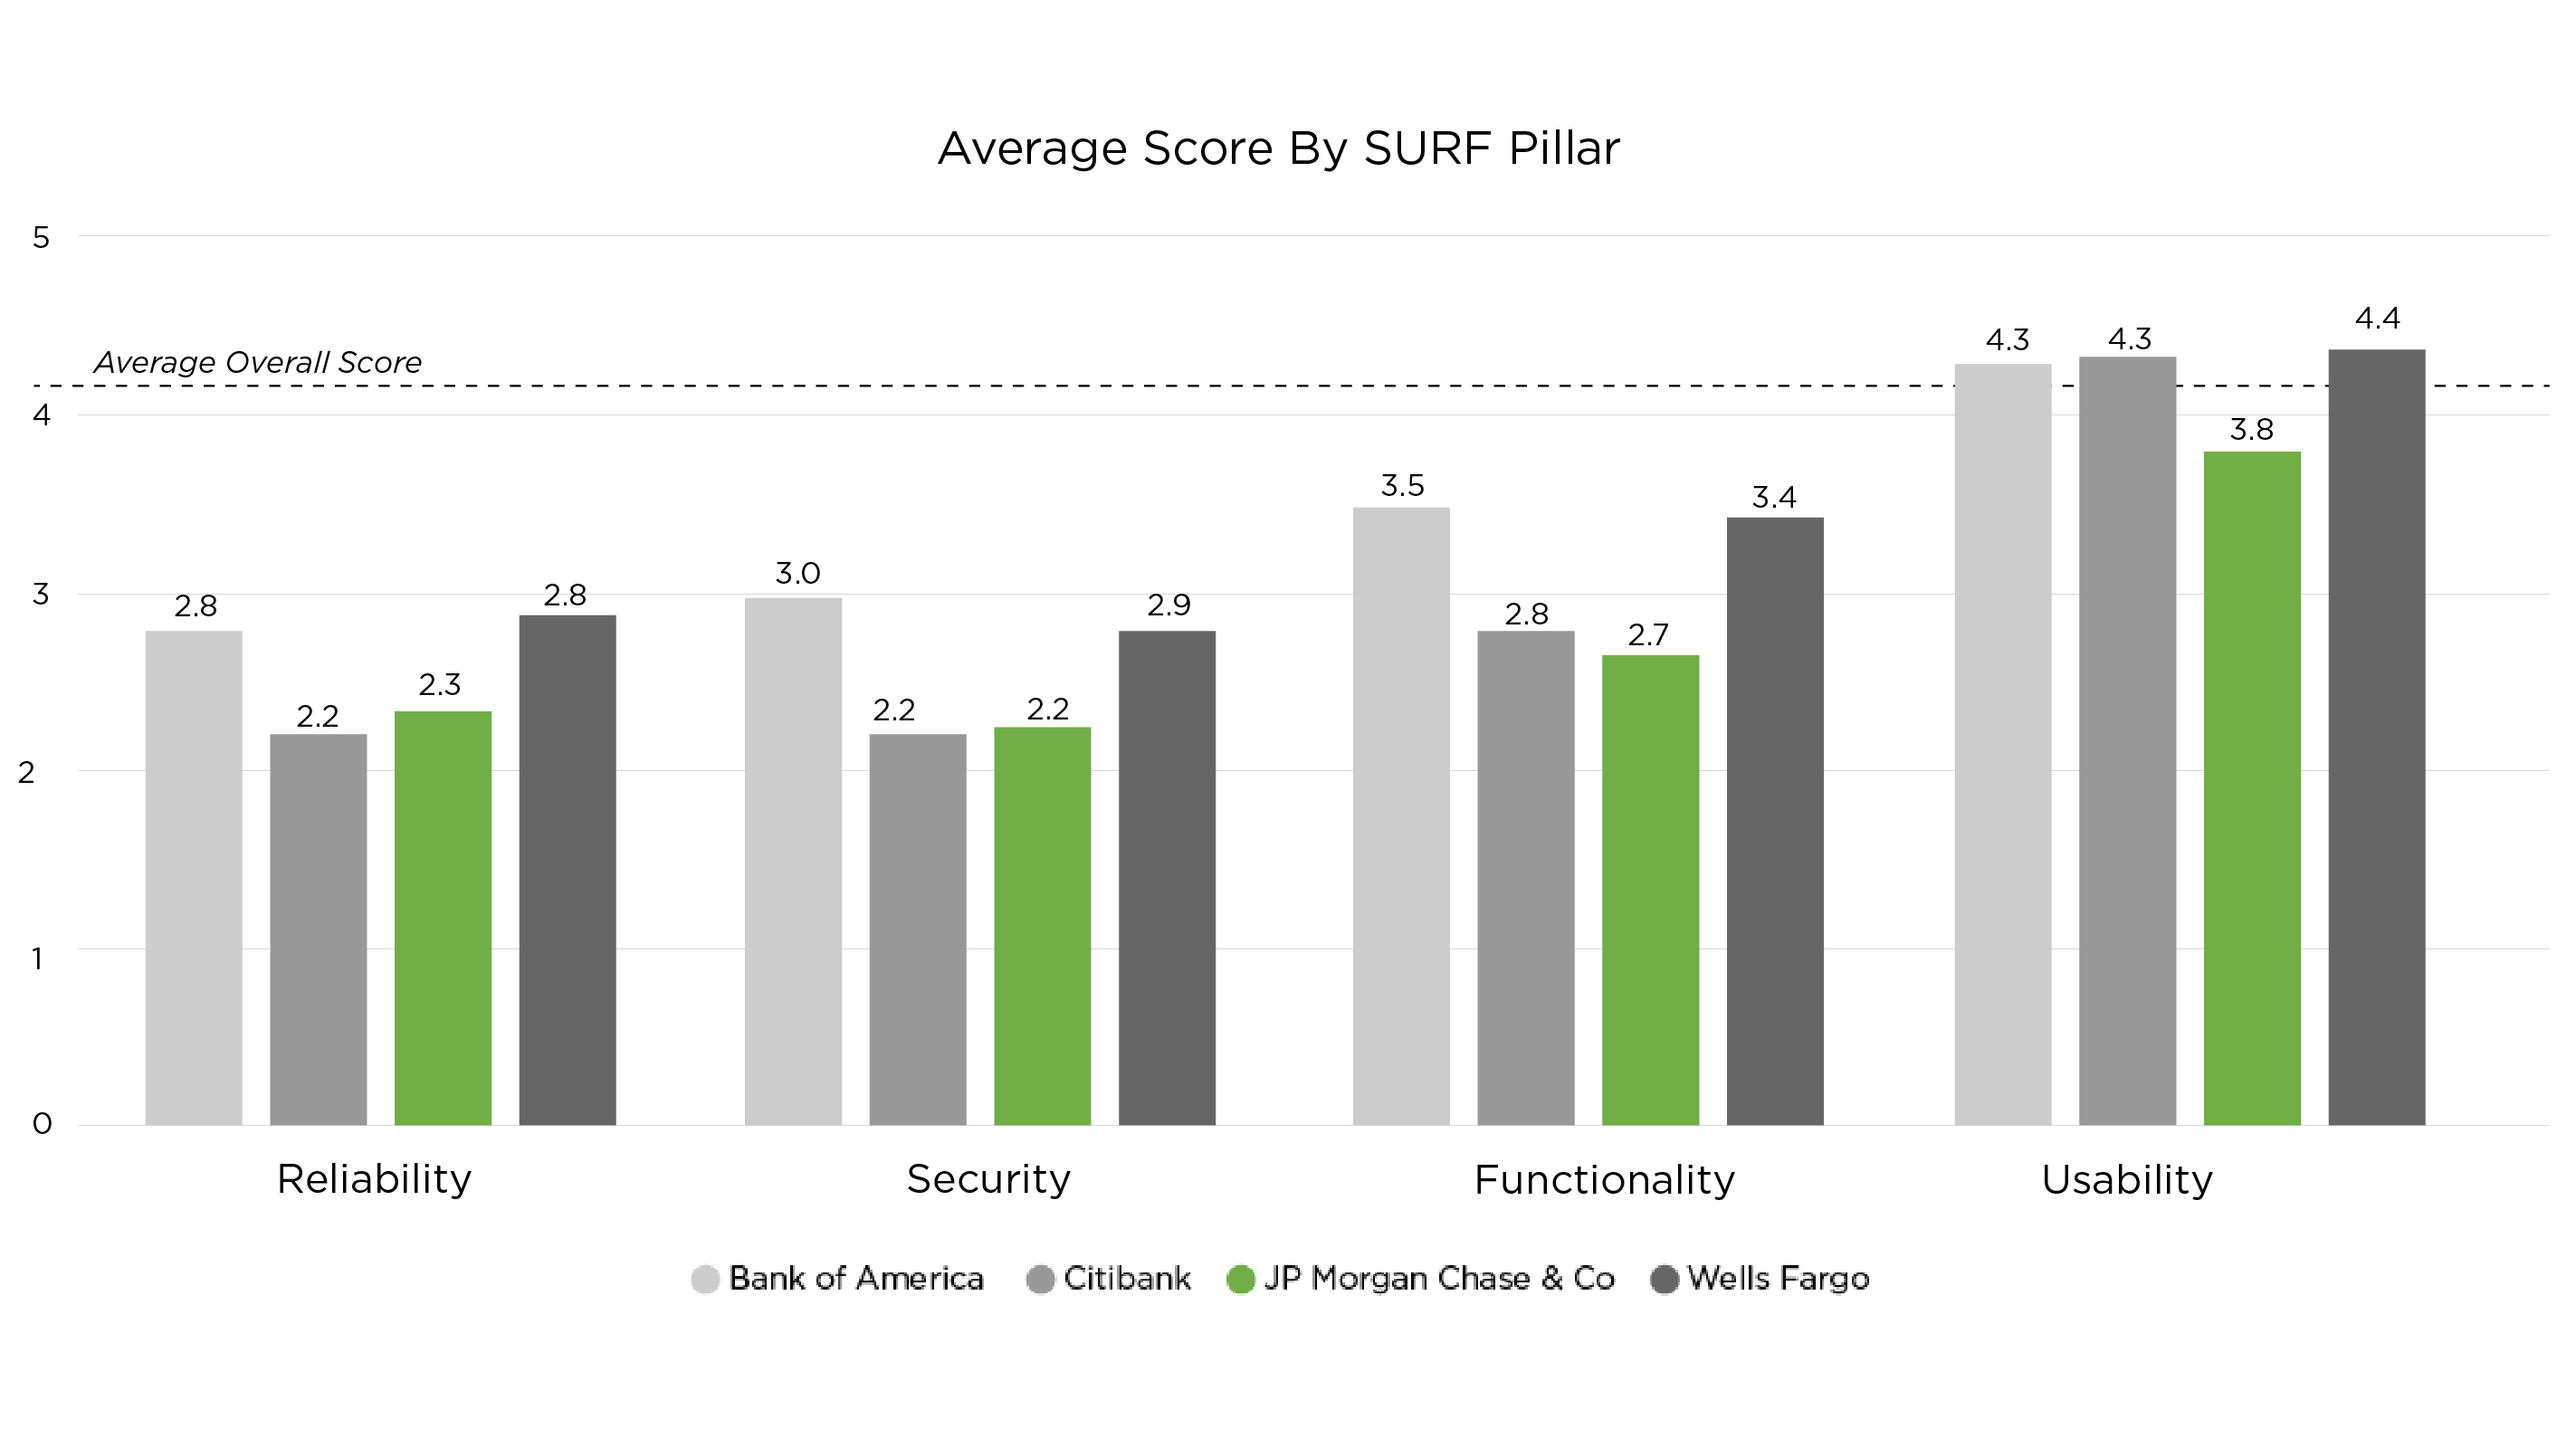 Ipiphany SURF Pillar Analysis